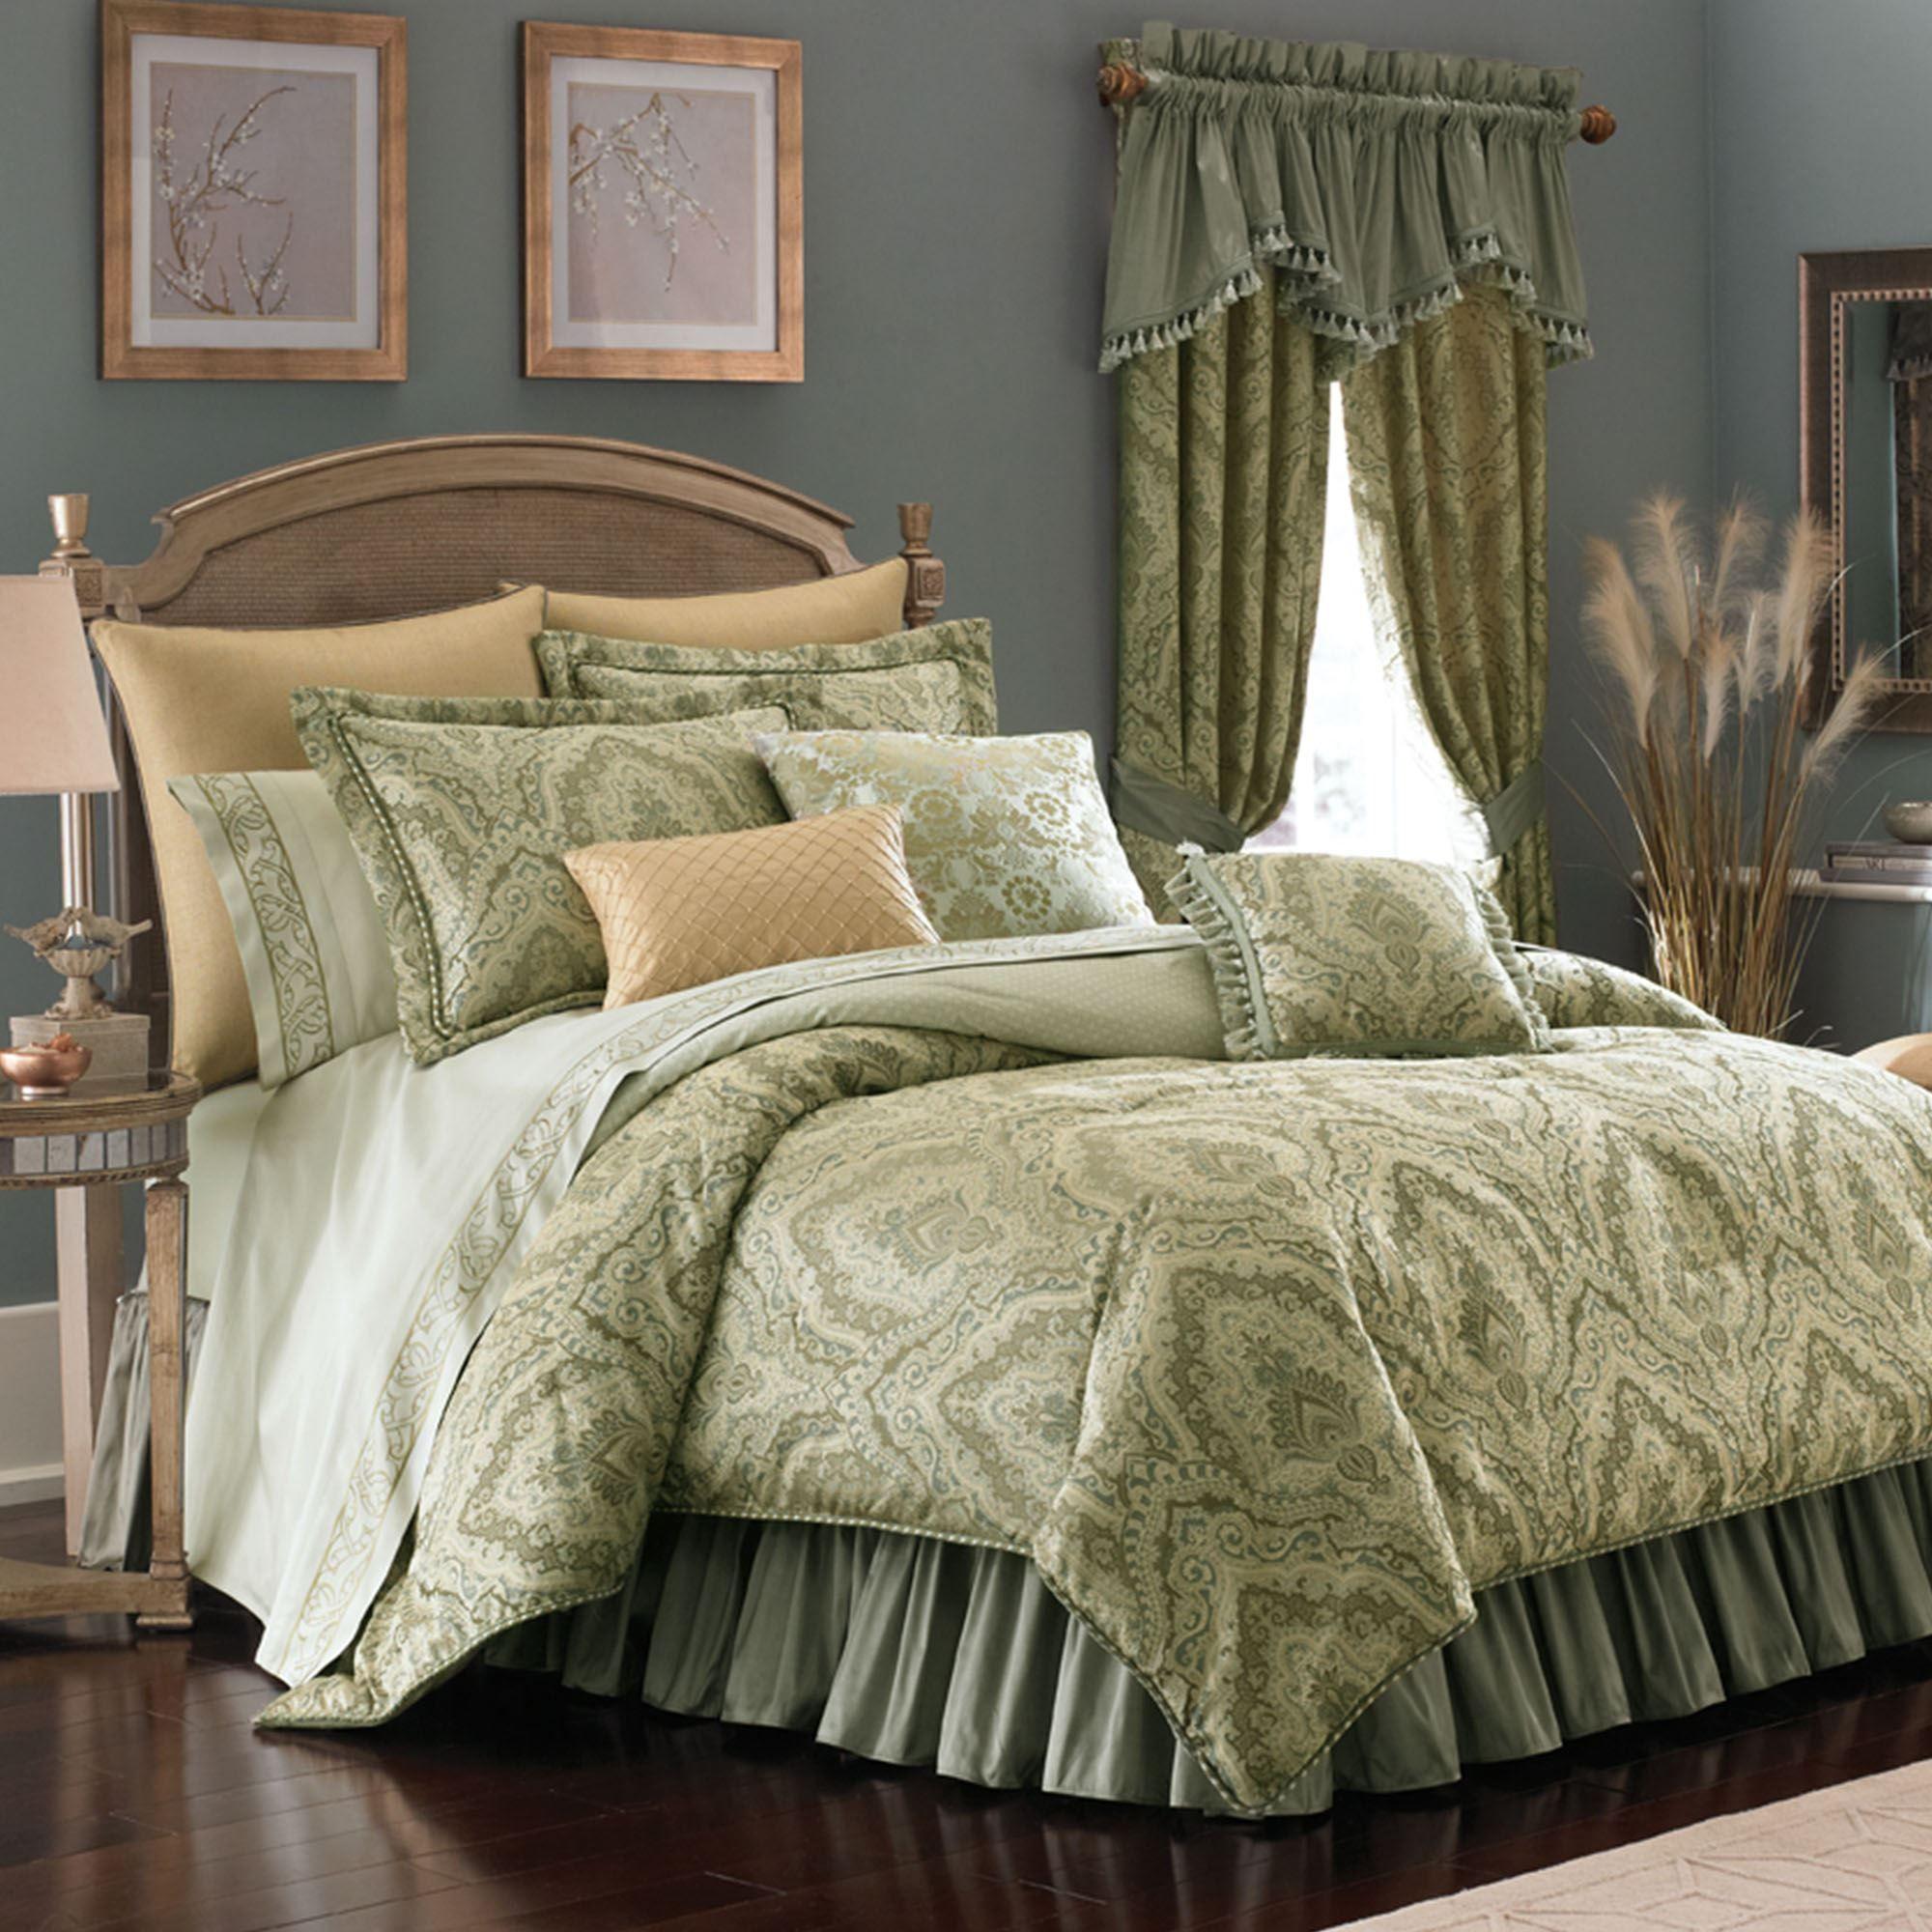 croscill pc spice bed galleria comforter set p by bedding